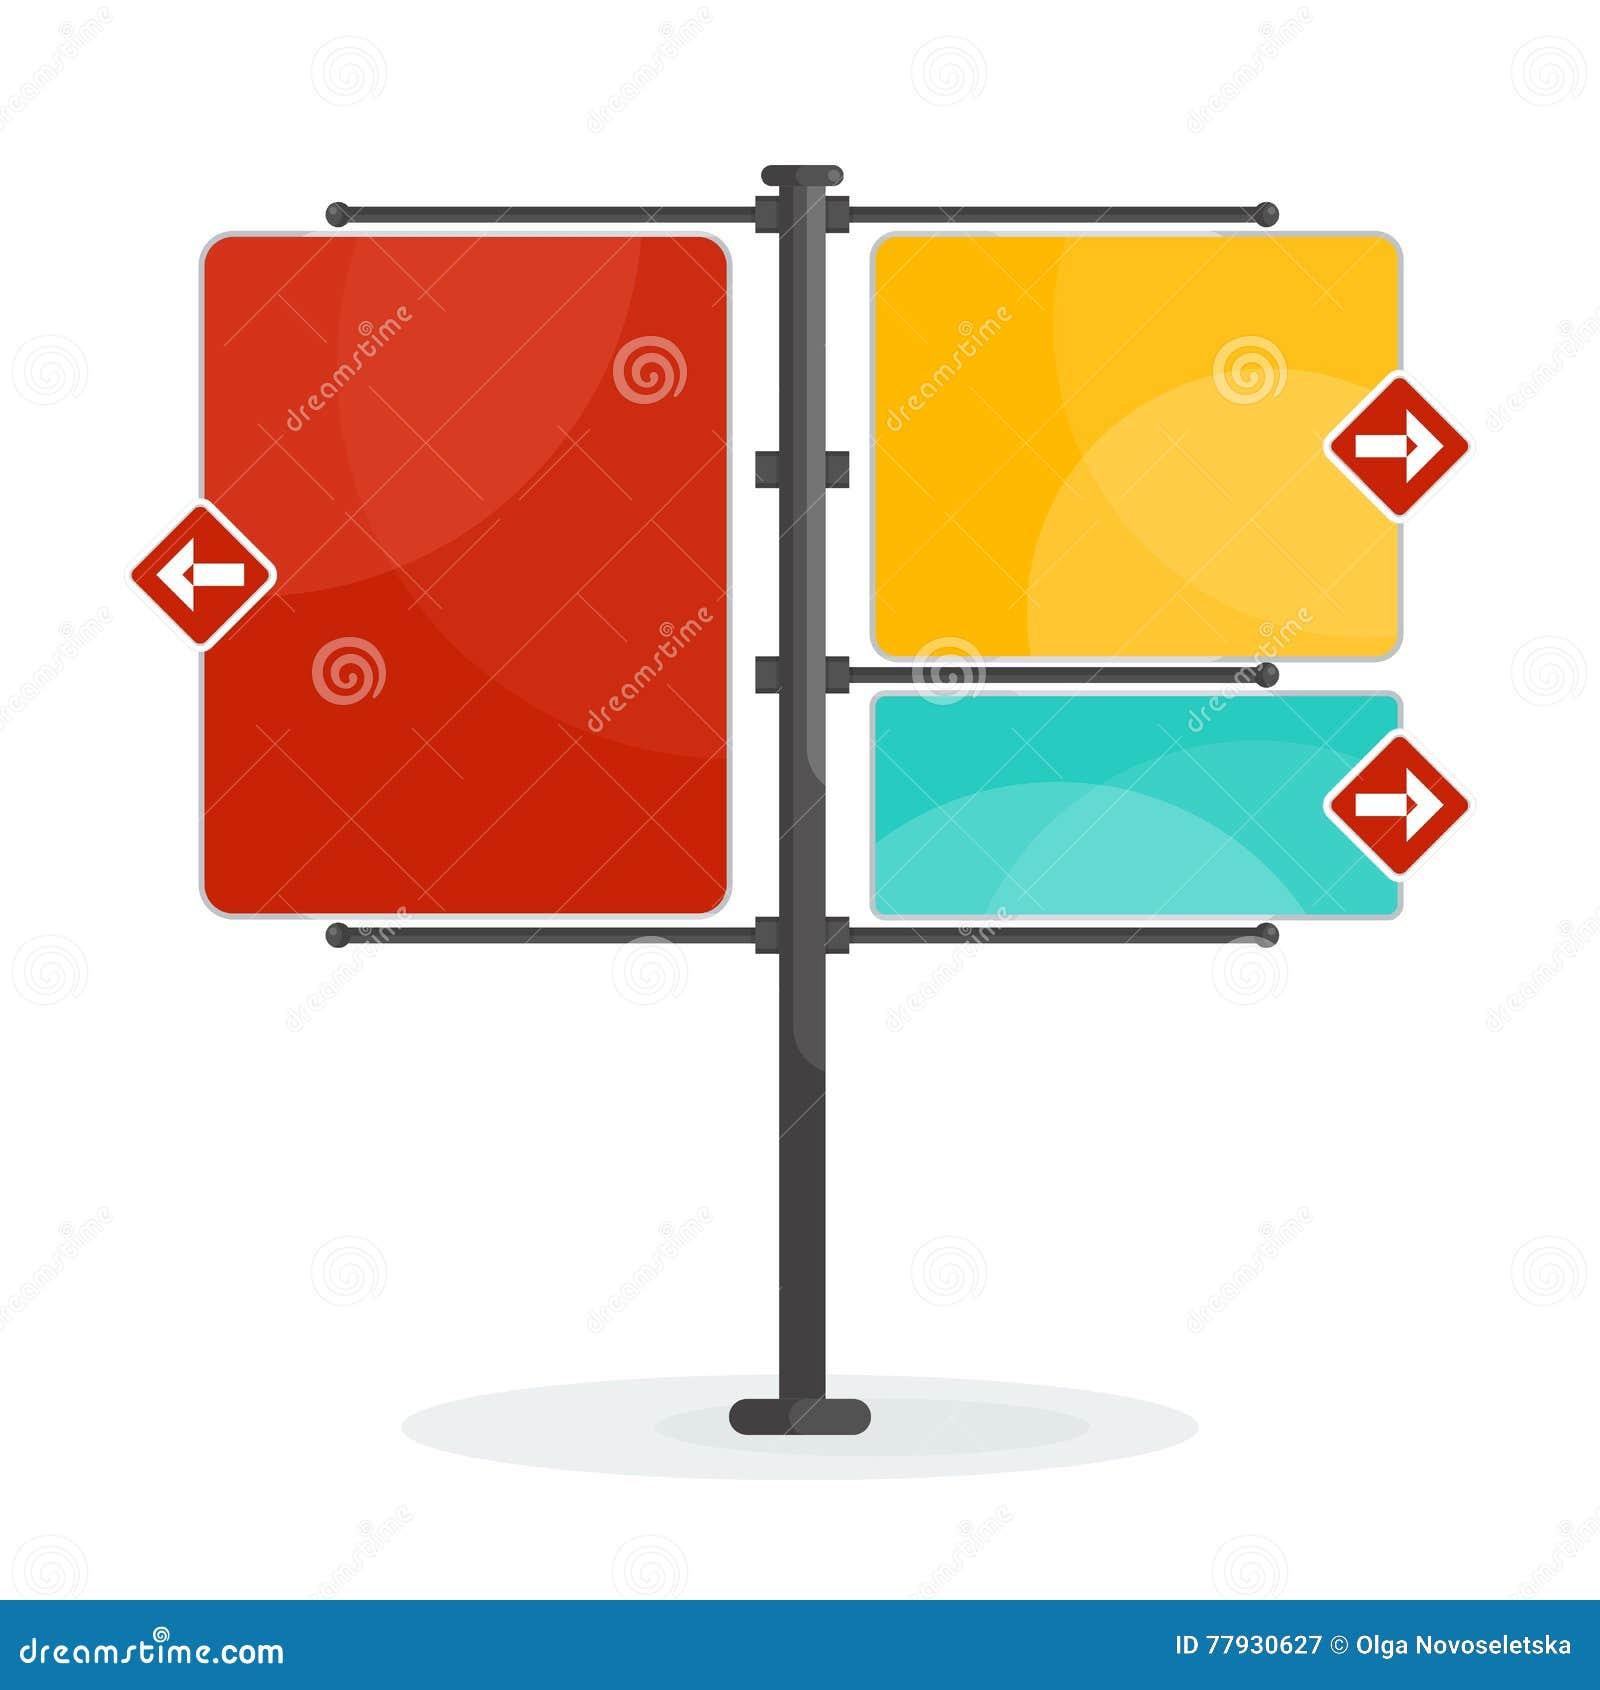 vector street sign stock vector illustration of